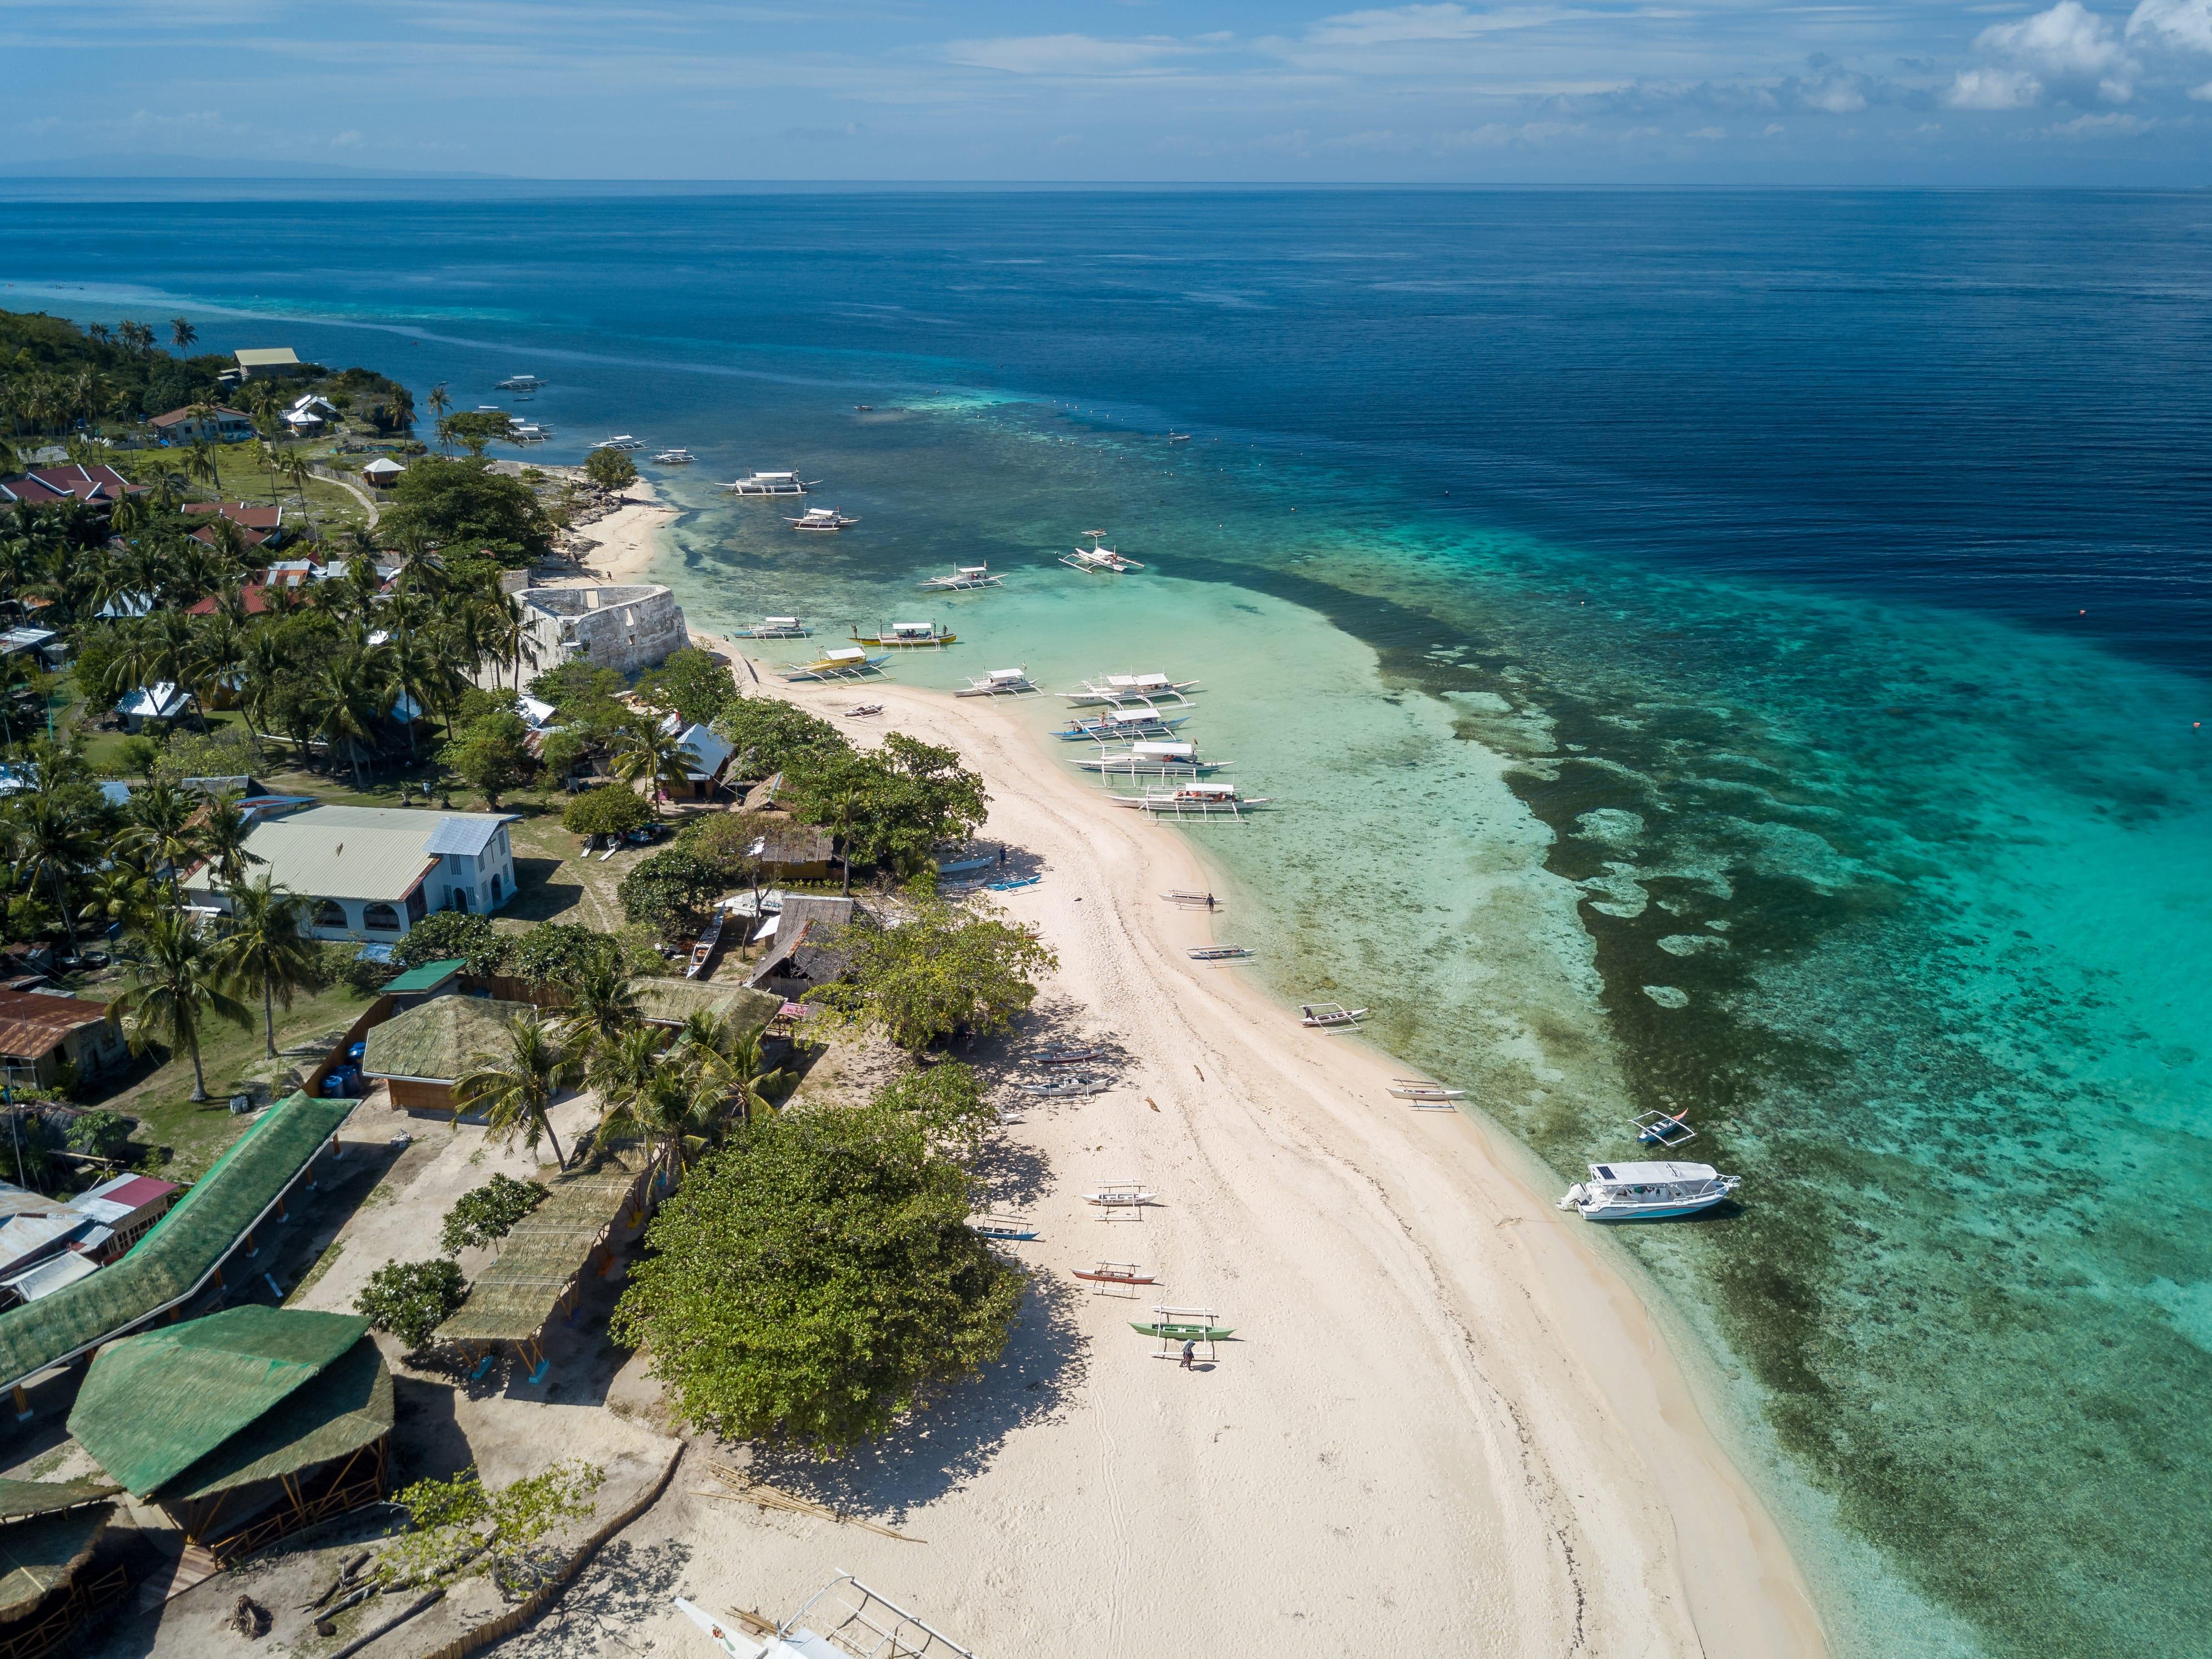 Paradise island of Pamilacan in Bohol